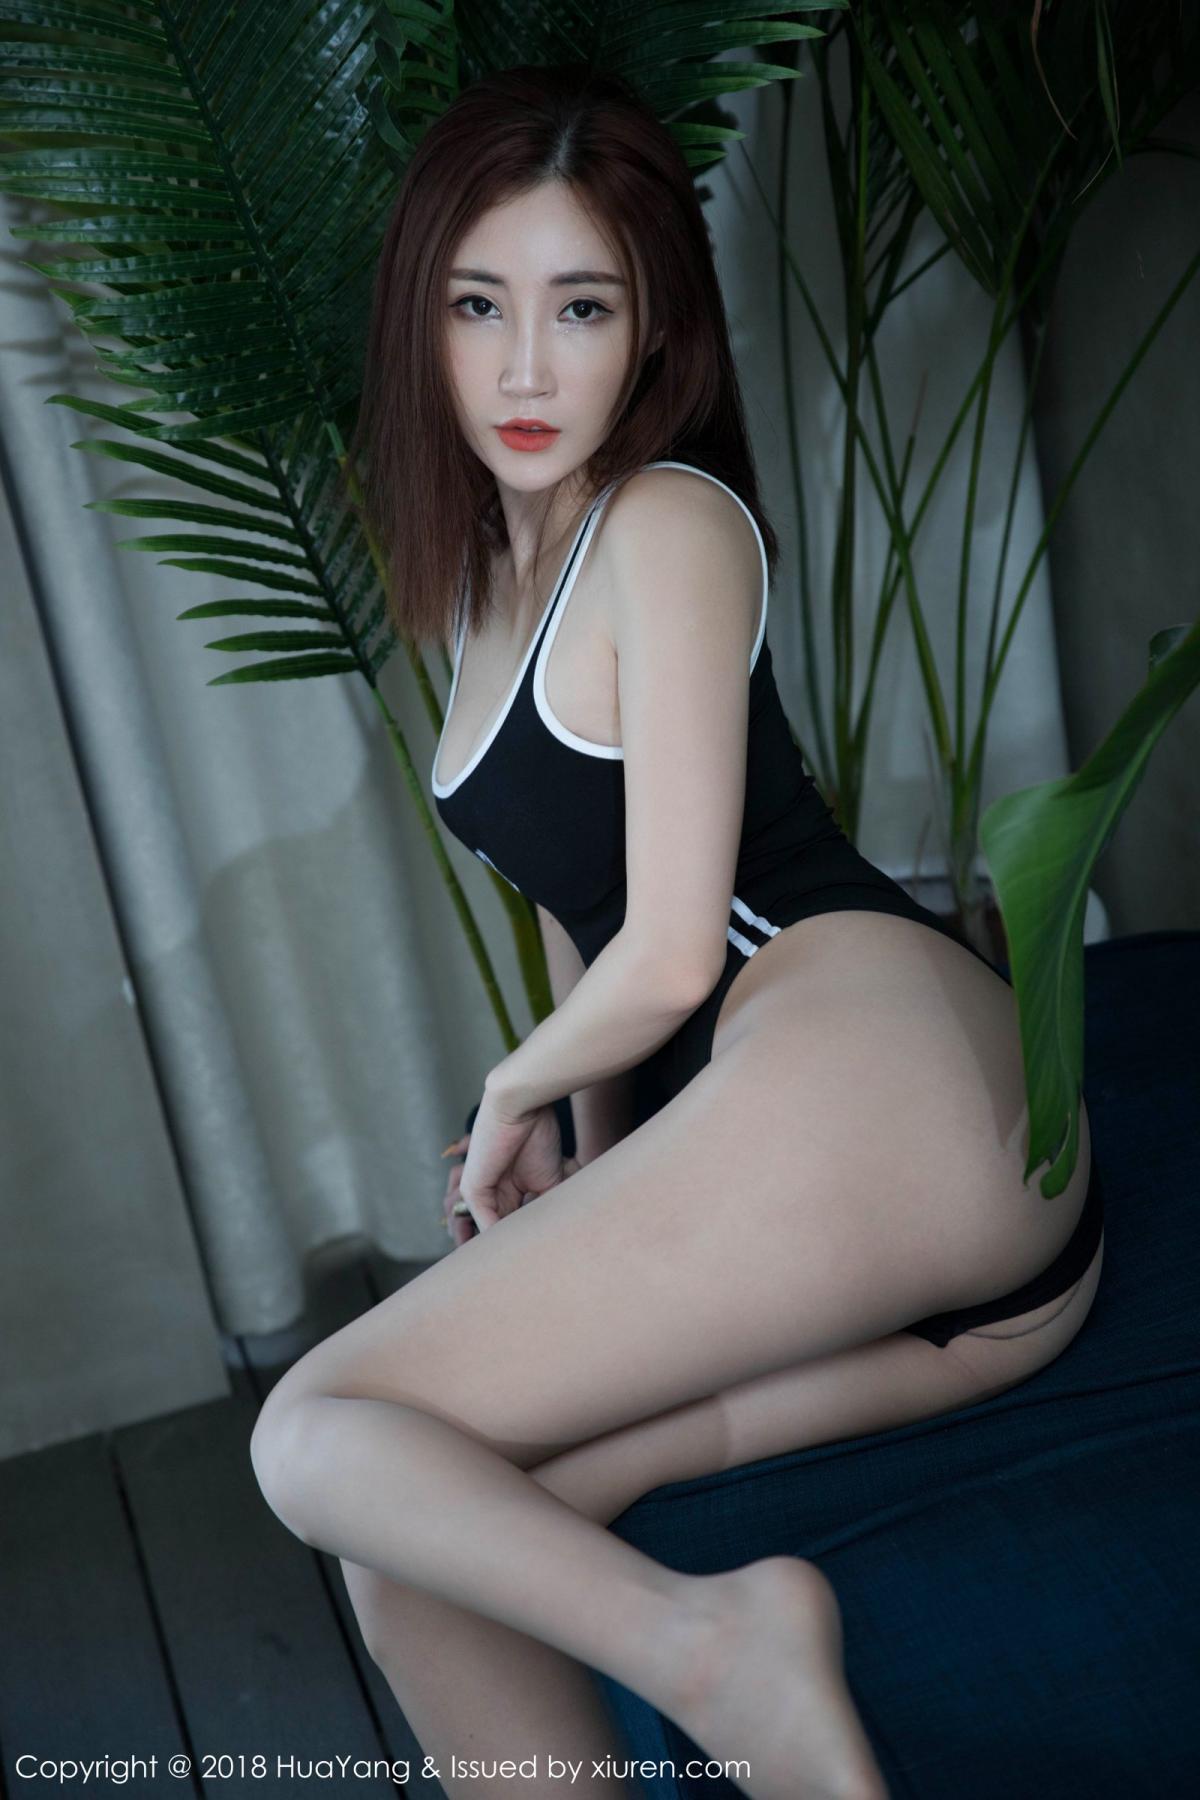 [Huayang] Vol.092 Sun Meng Yao 30P, HuaYang, Nurse, Sun Meng Yao, Tall, Uniform